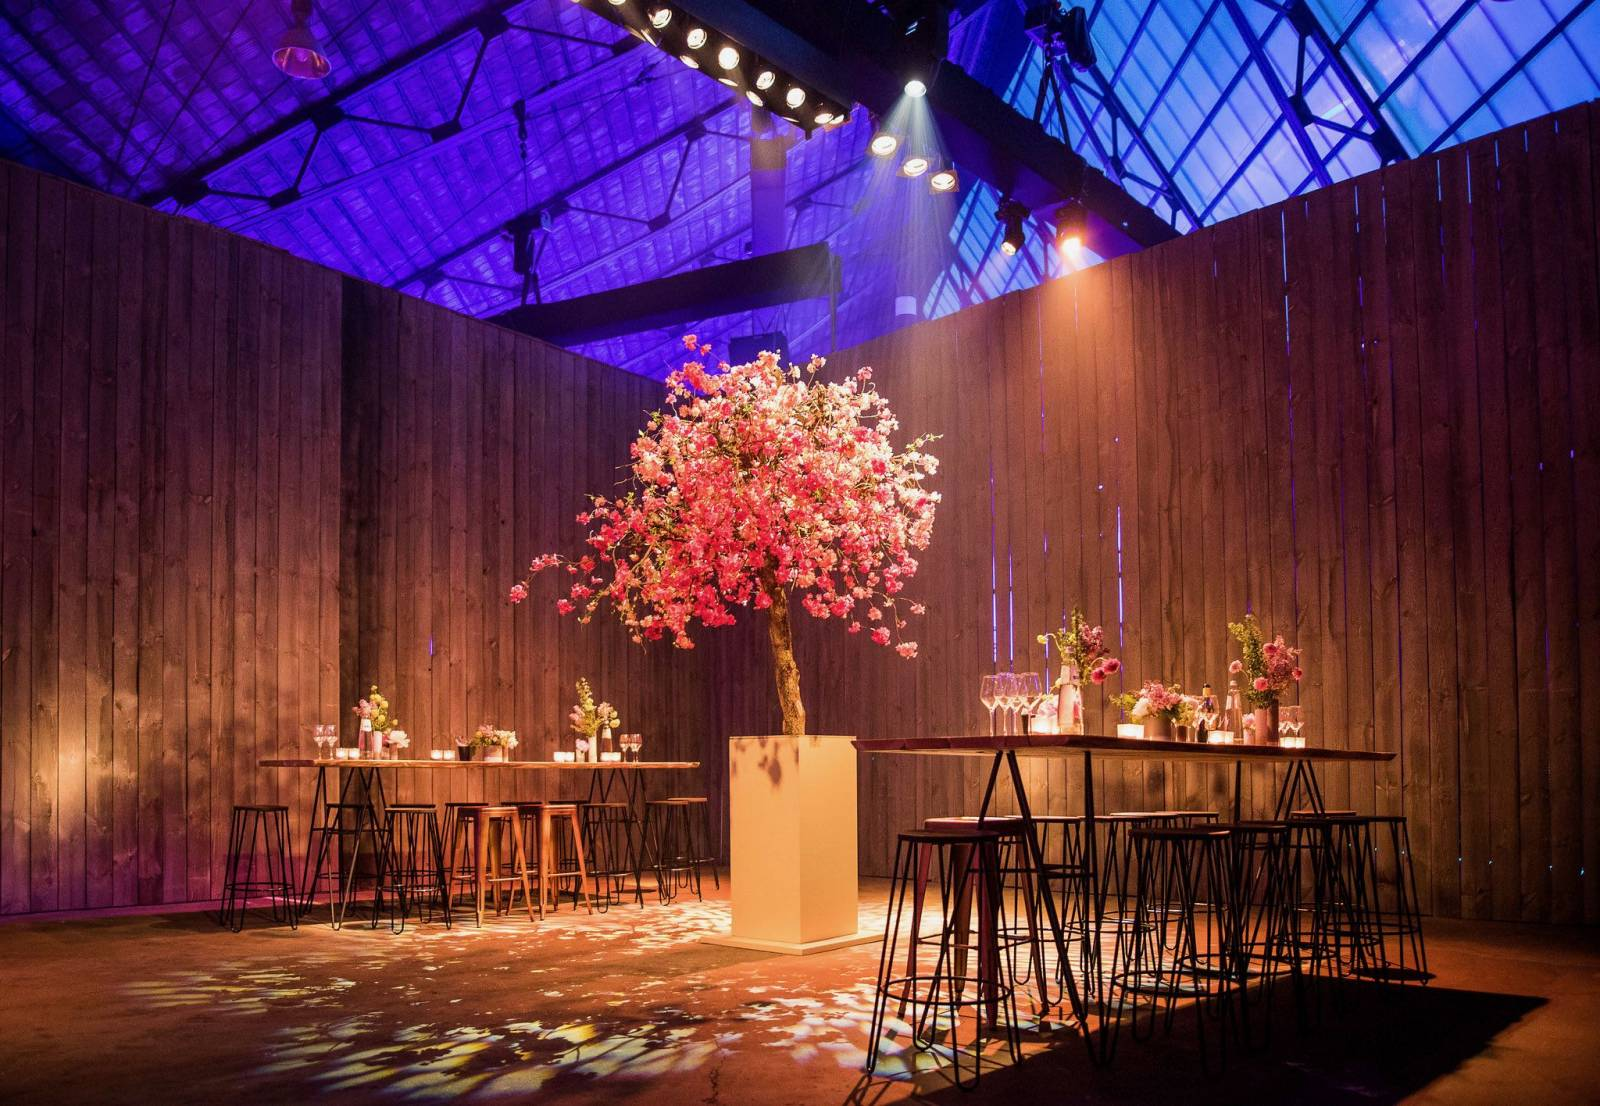 Panache Events - Fotograaf Aloha Fred - Wedding Planner - House of Weddings 3